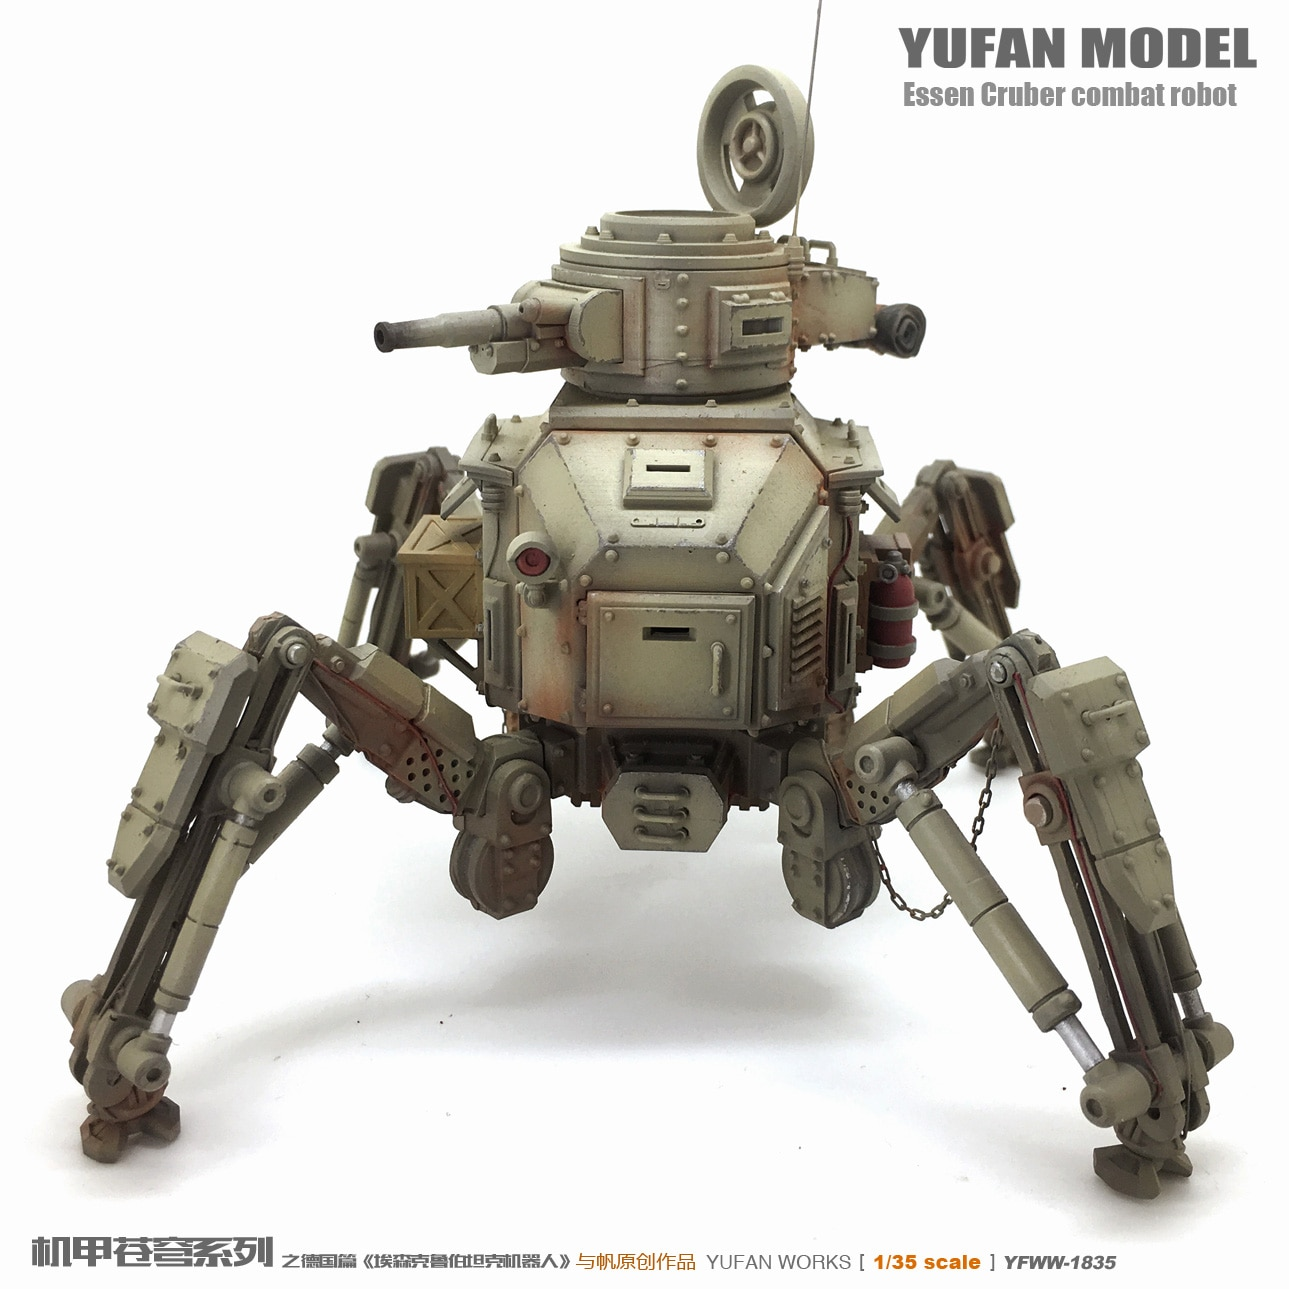 Yufan modelo 1/35 Kit de modelo de soldado de resina creado originalmente armadura cielo tanque Robot YFWW-1835